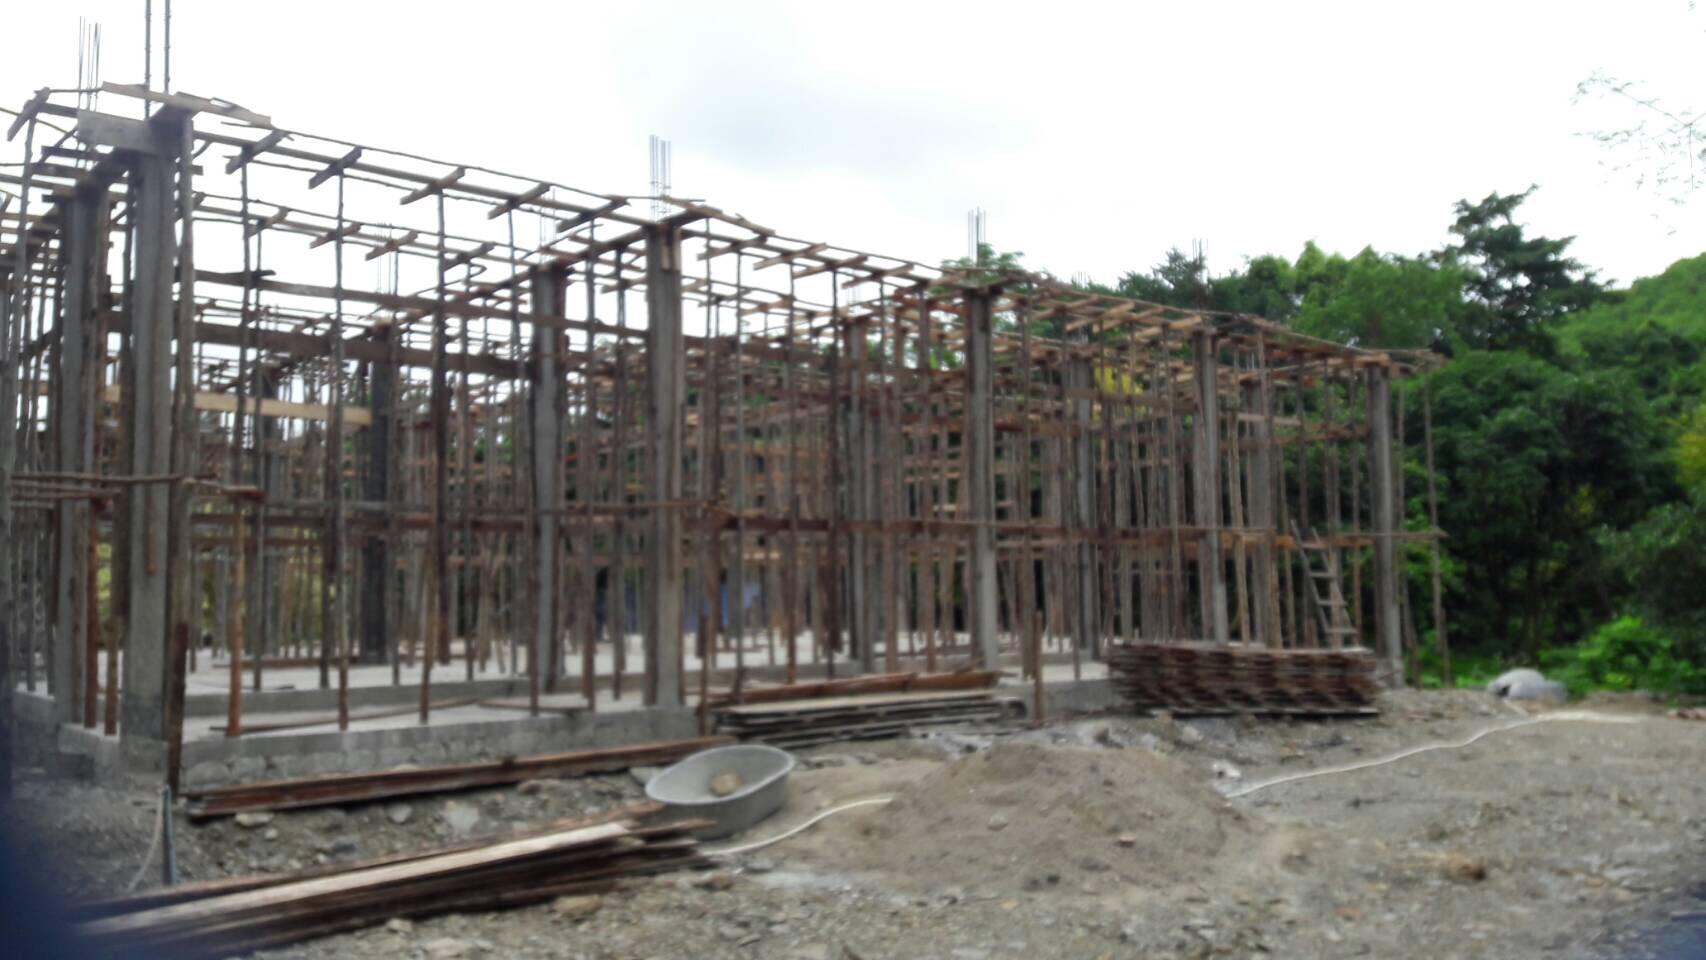 JURNESS donated 50,000 Baht for building the meditation pavilion